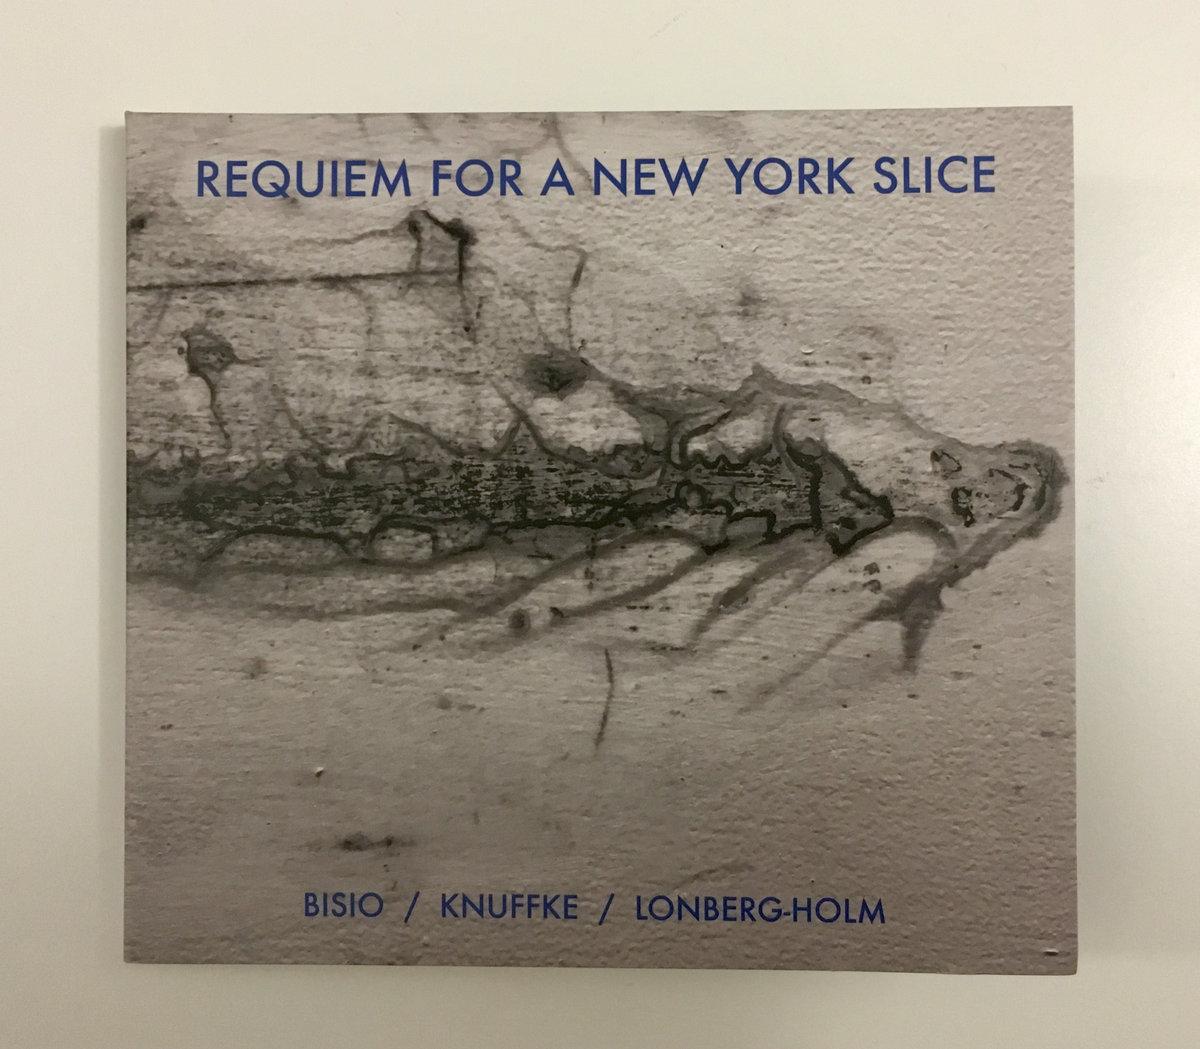 Requiem for a dream song piano mp3 download | Requiem for a Dream